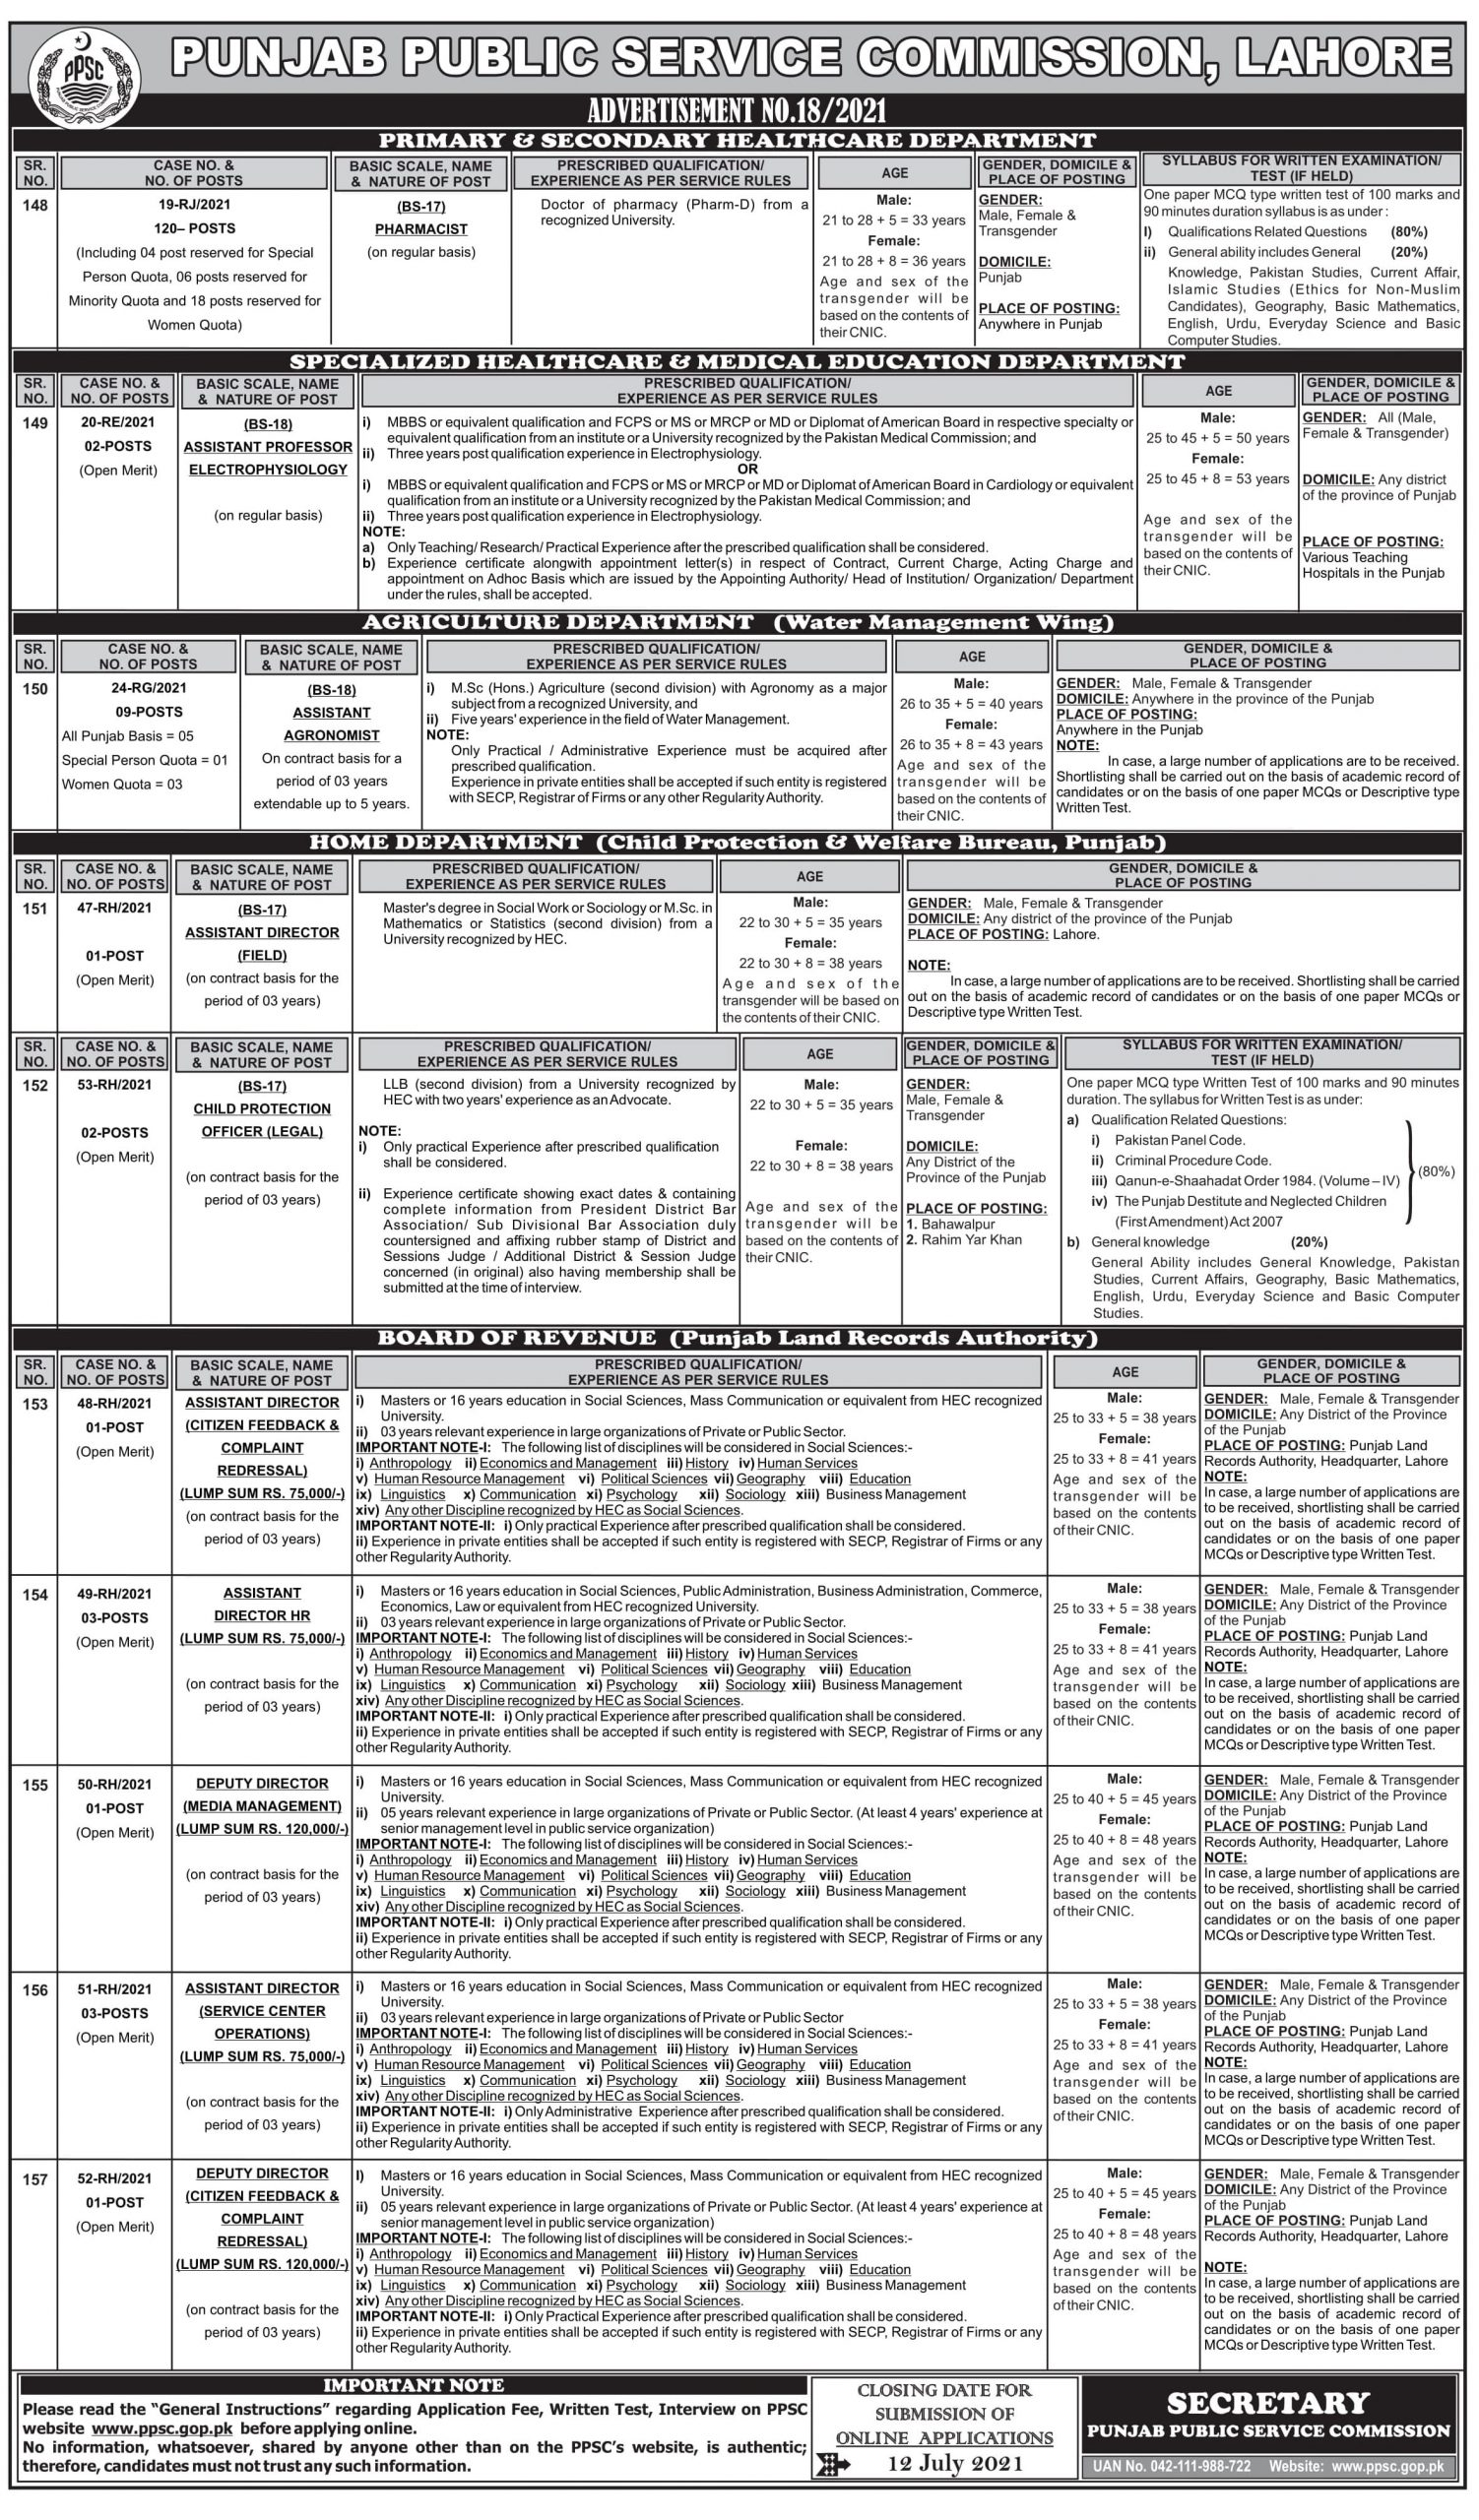 PPSC Jobs Advertisement No 18-2021 Apply Online